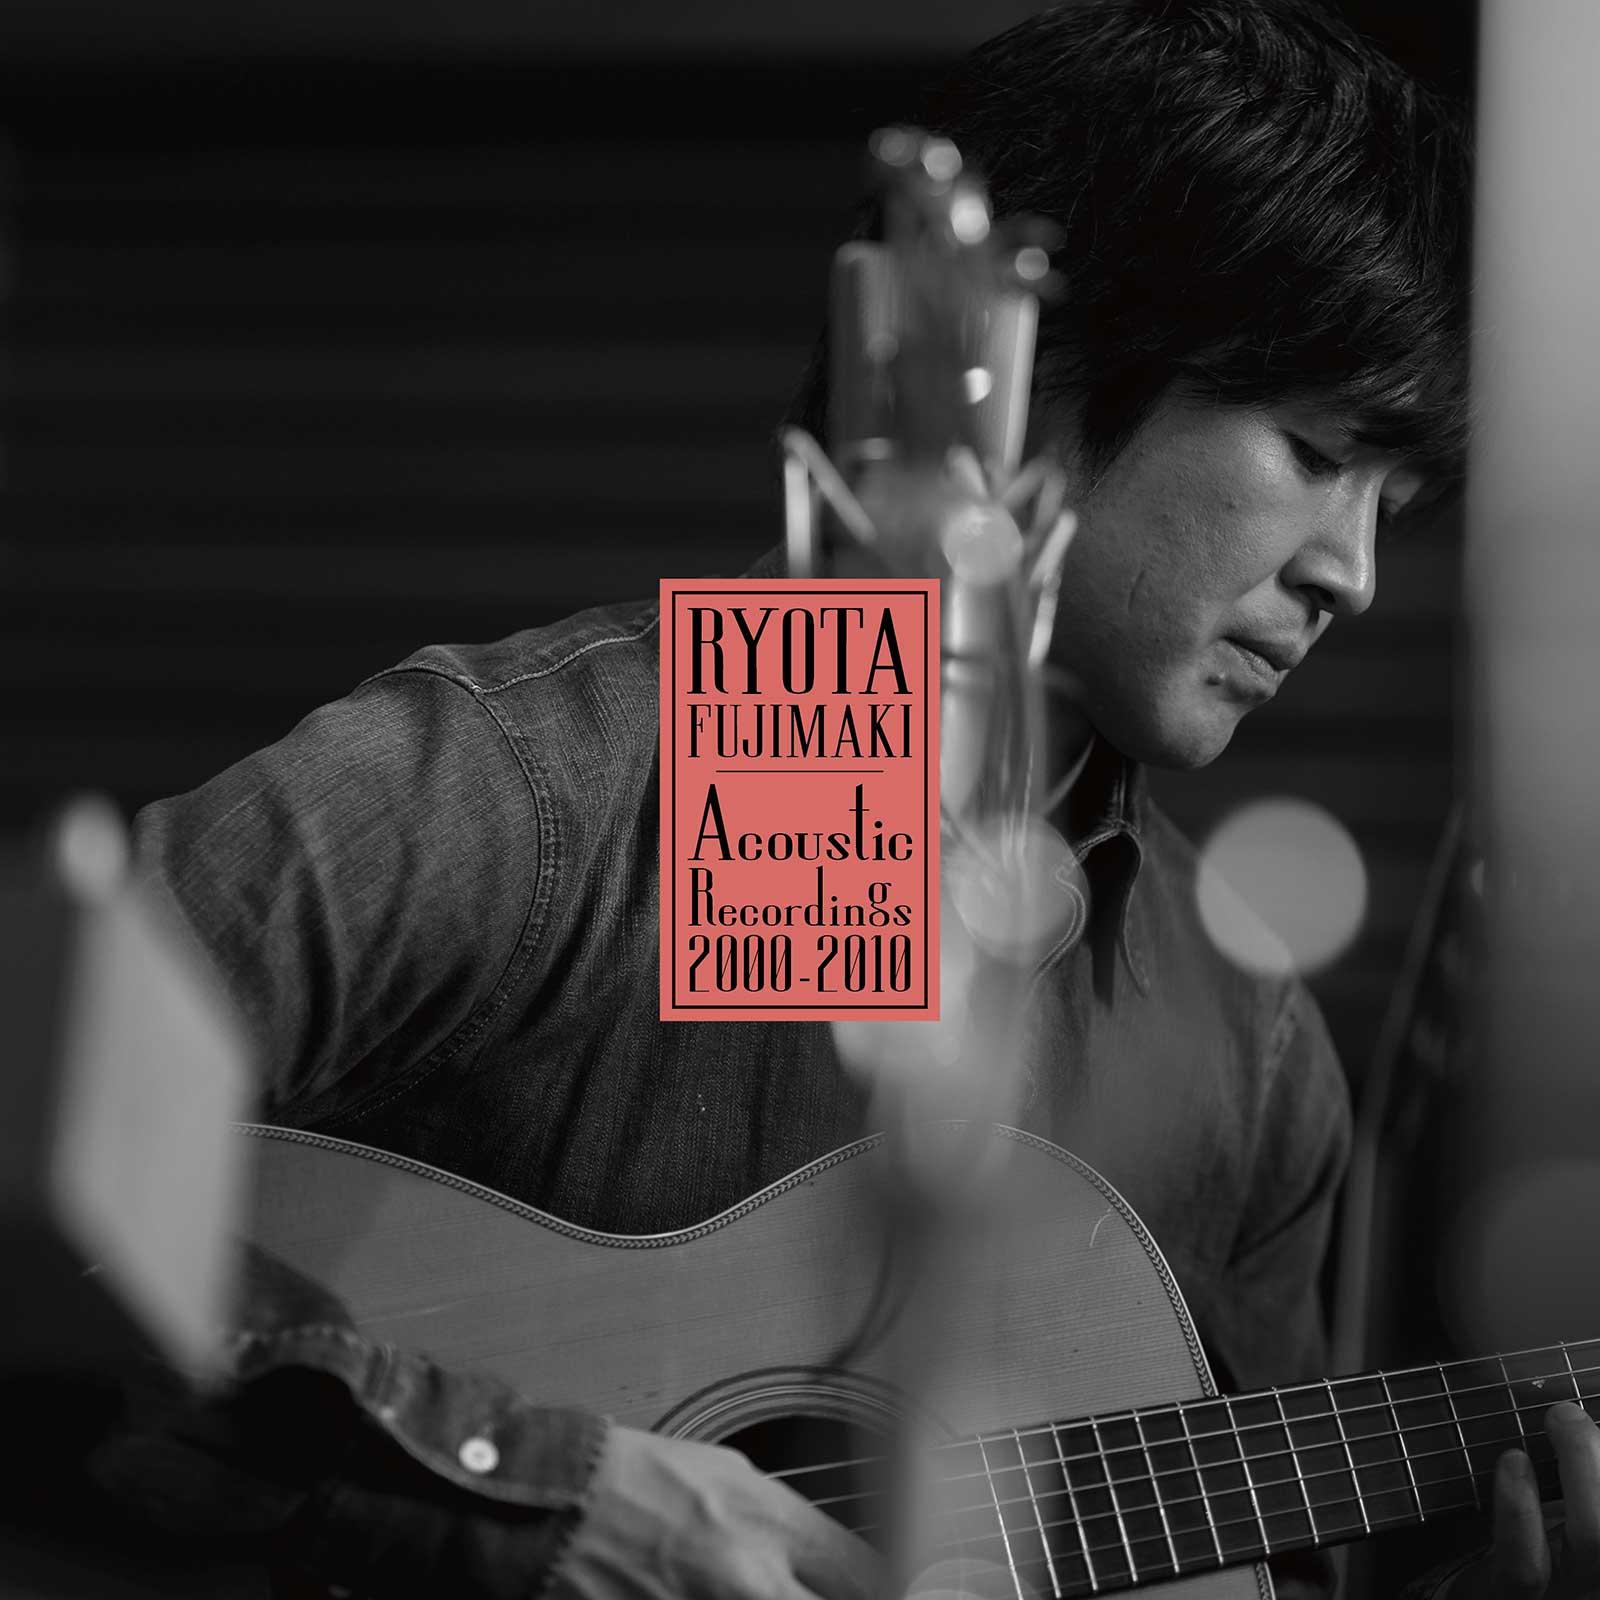 「RYOTA FUJIMAKI Acoustic Recordings 2000-2010」